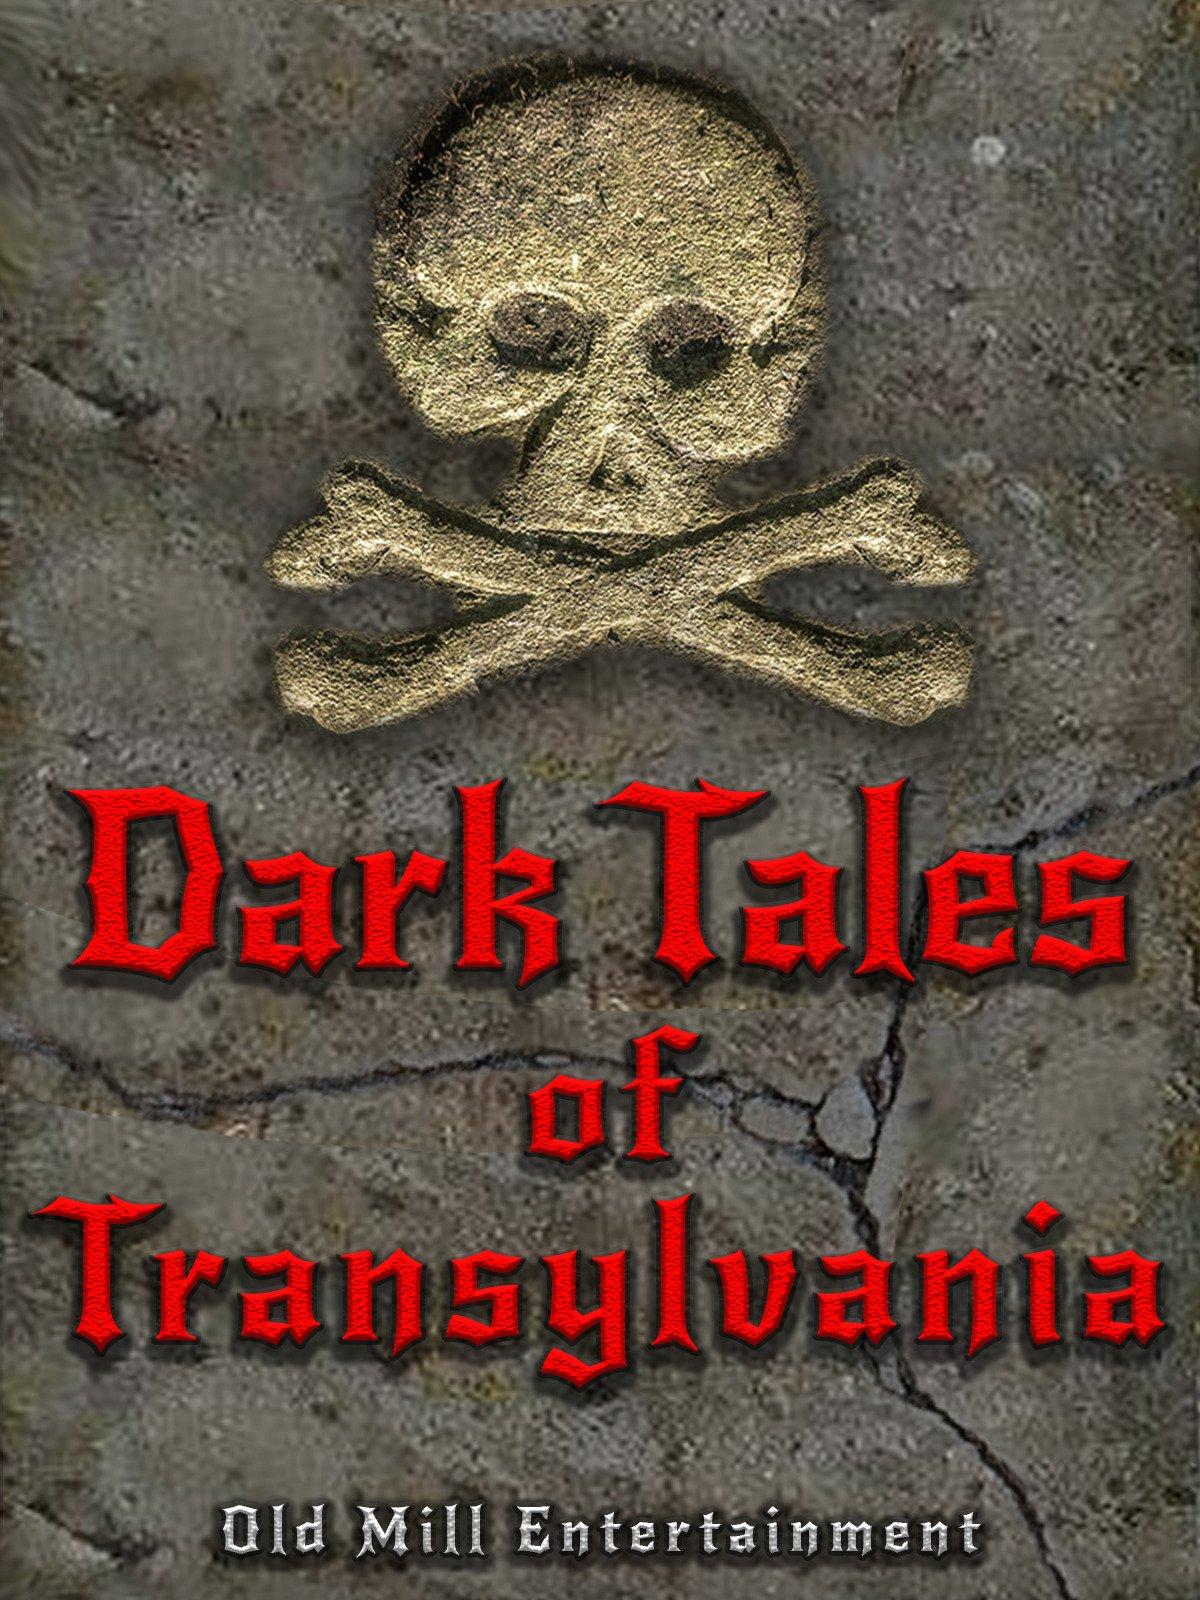 Dark Tales of Transylvania on Amazon Prime Video UK